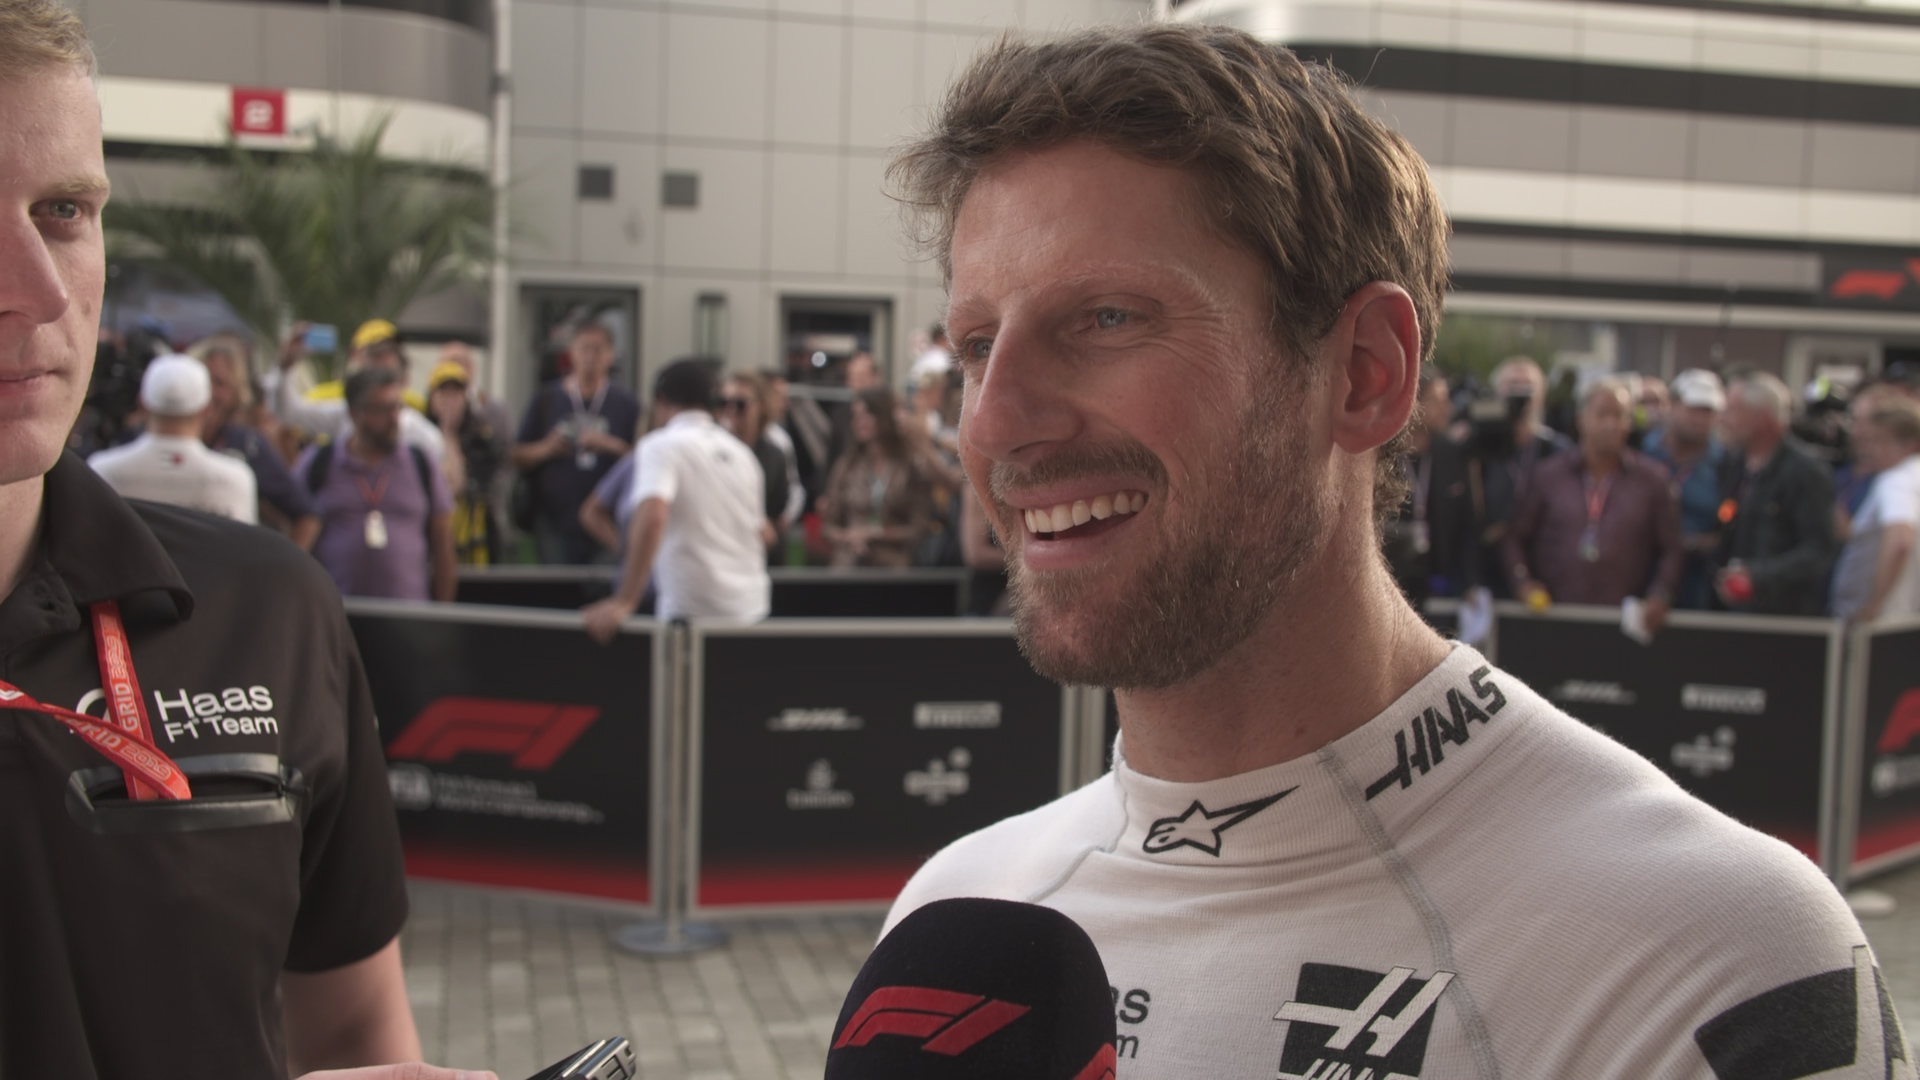 Romain Grosjean: Our race pace has been encouraging